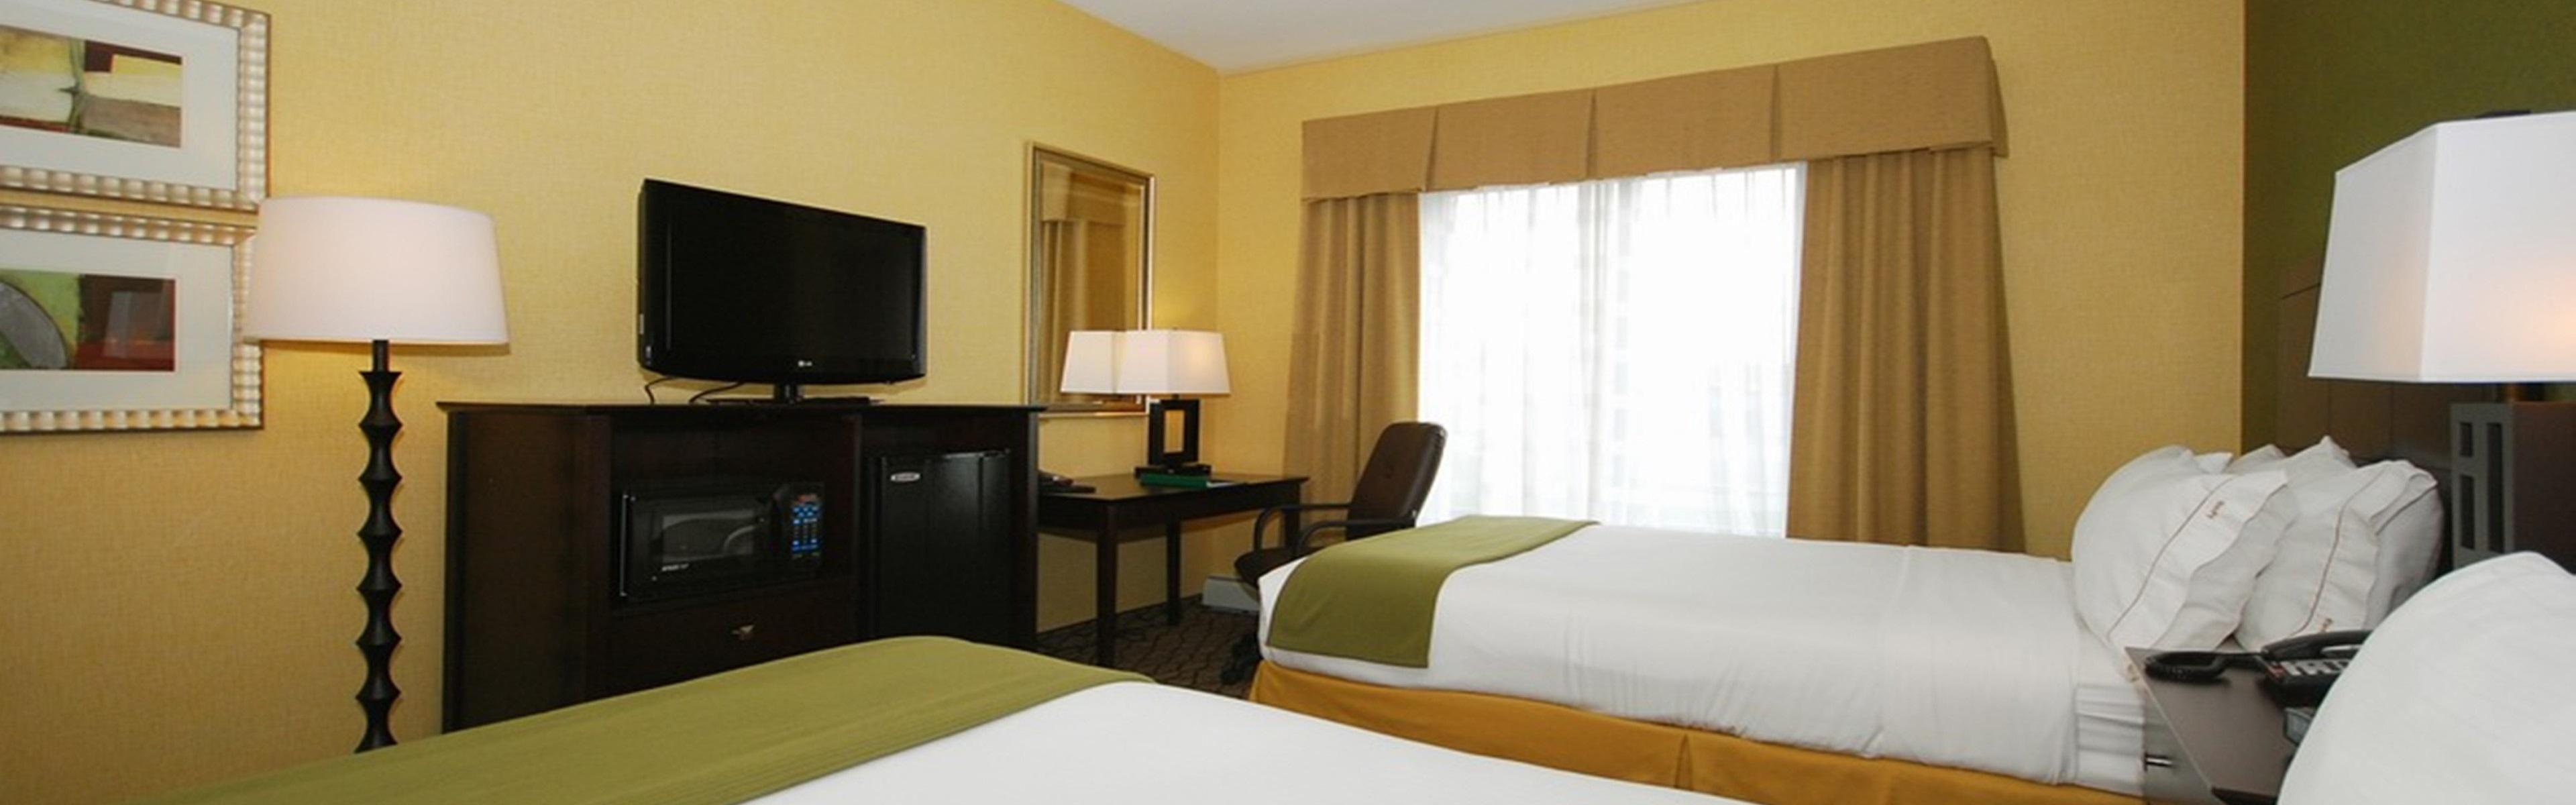 Kittanning Pa Hotels Motels